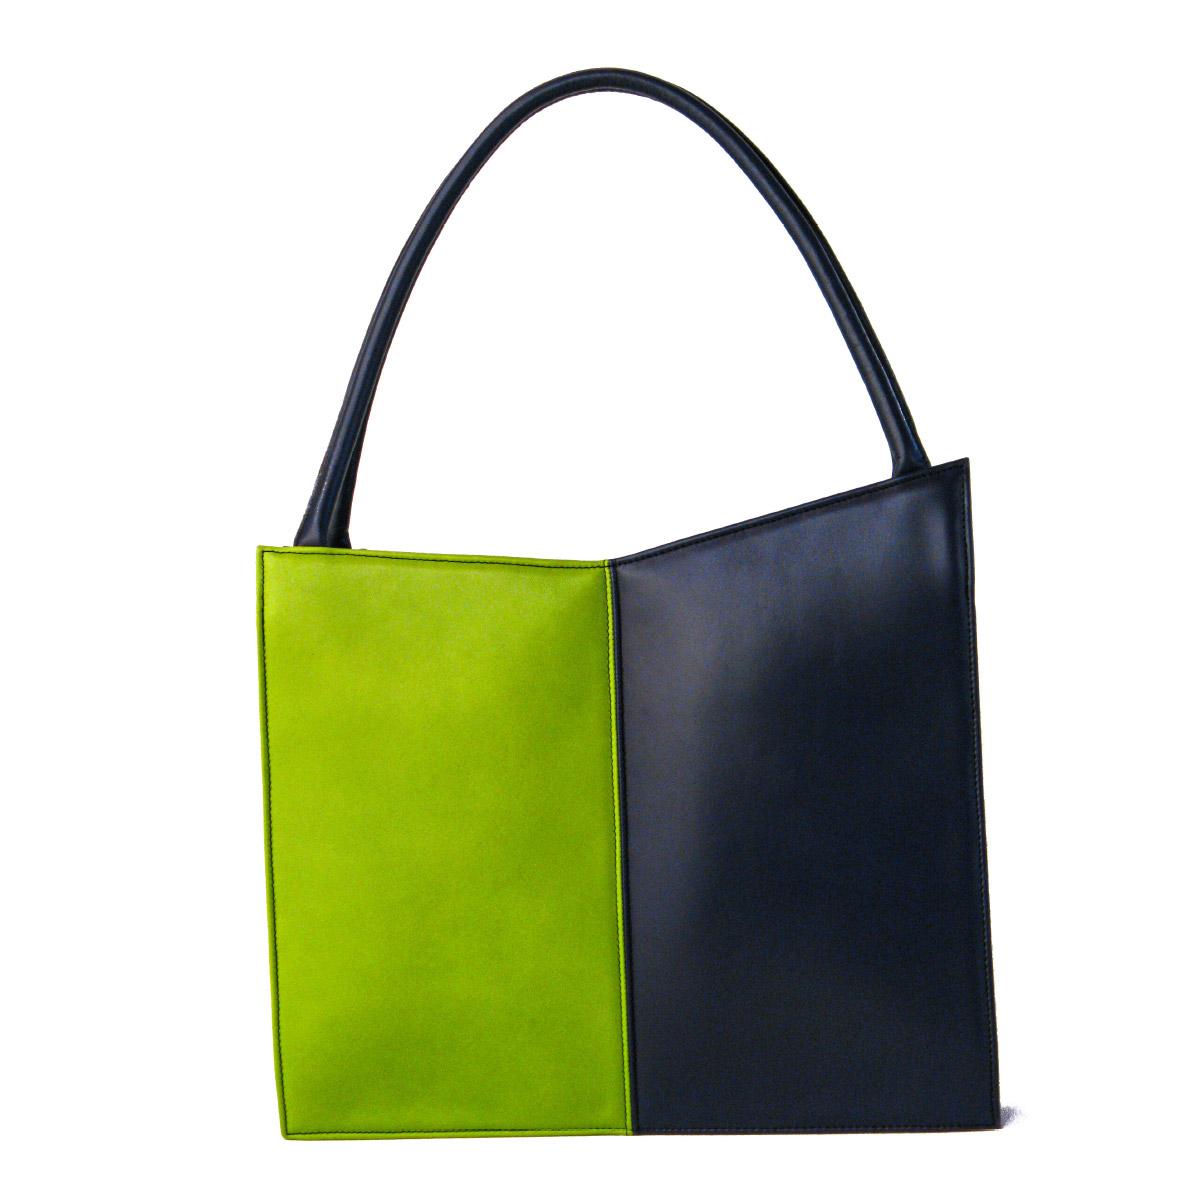 Annalisa Tessarolo Purse Verdeblu leather Italiano Plurale